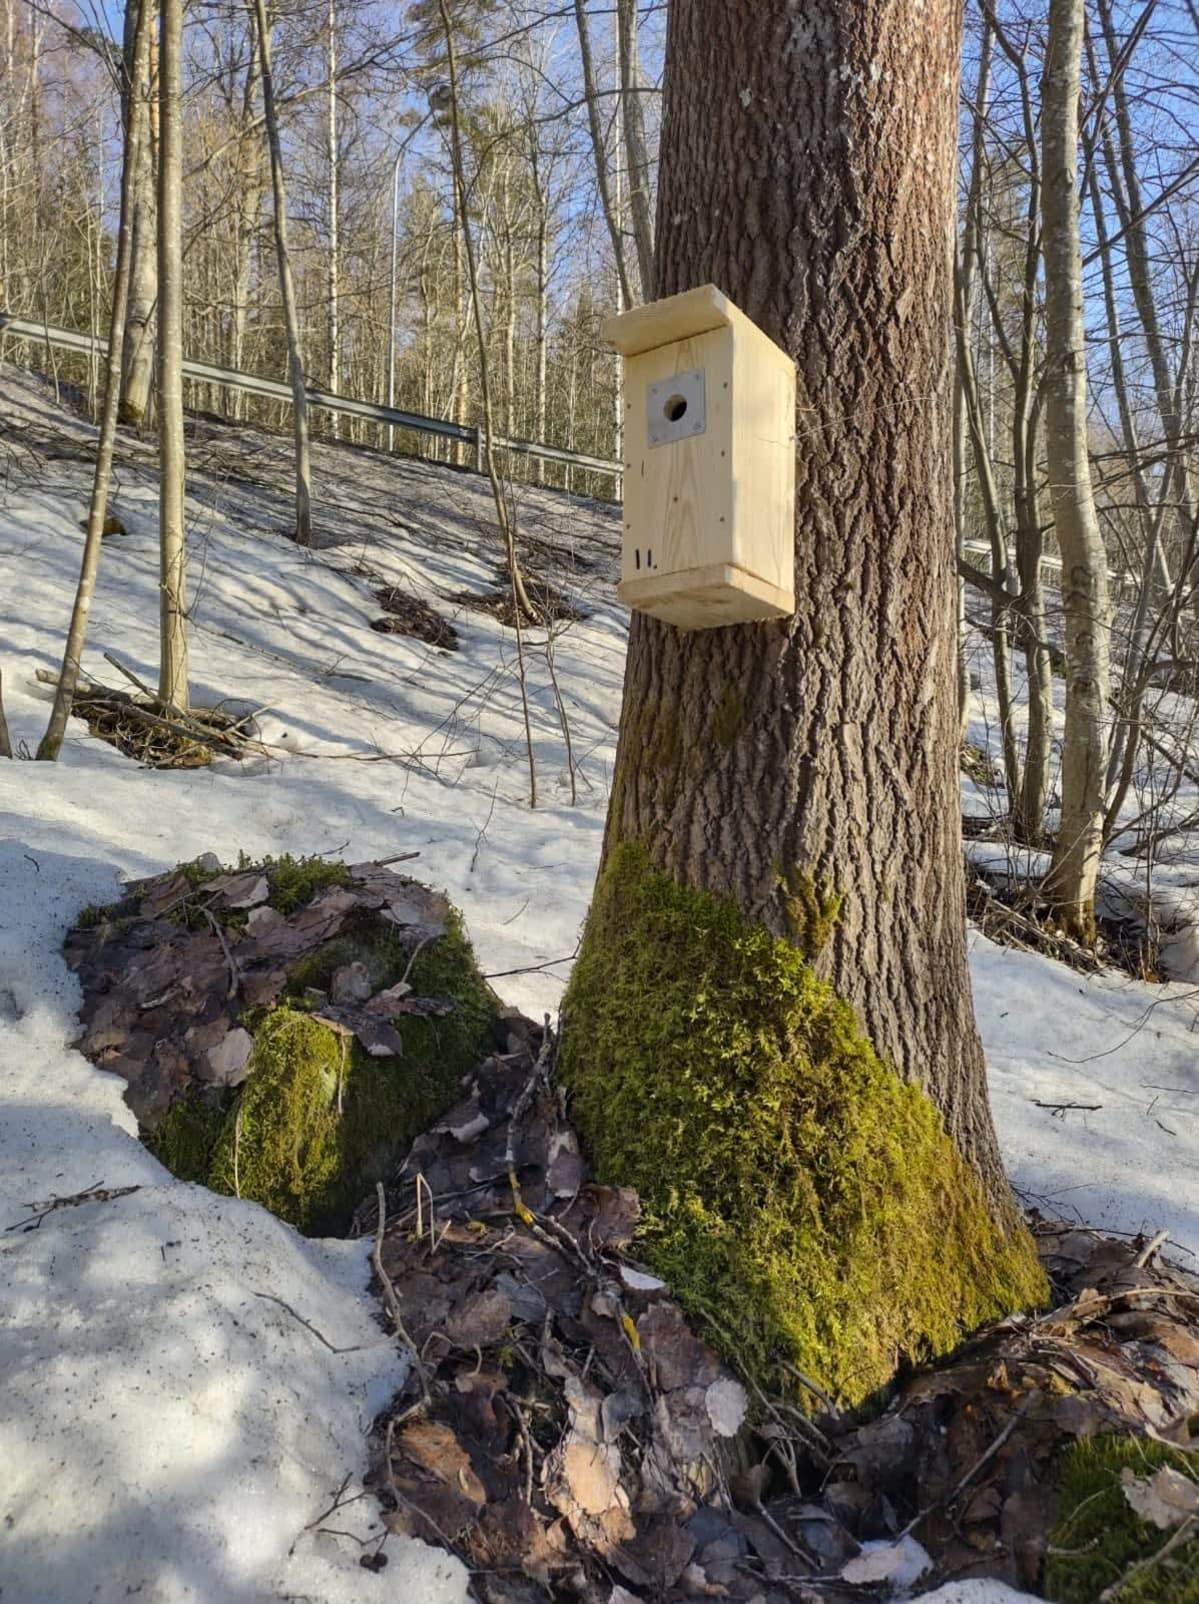 Linnunpönttö ripustettuna puuhun.